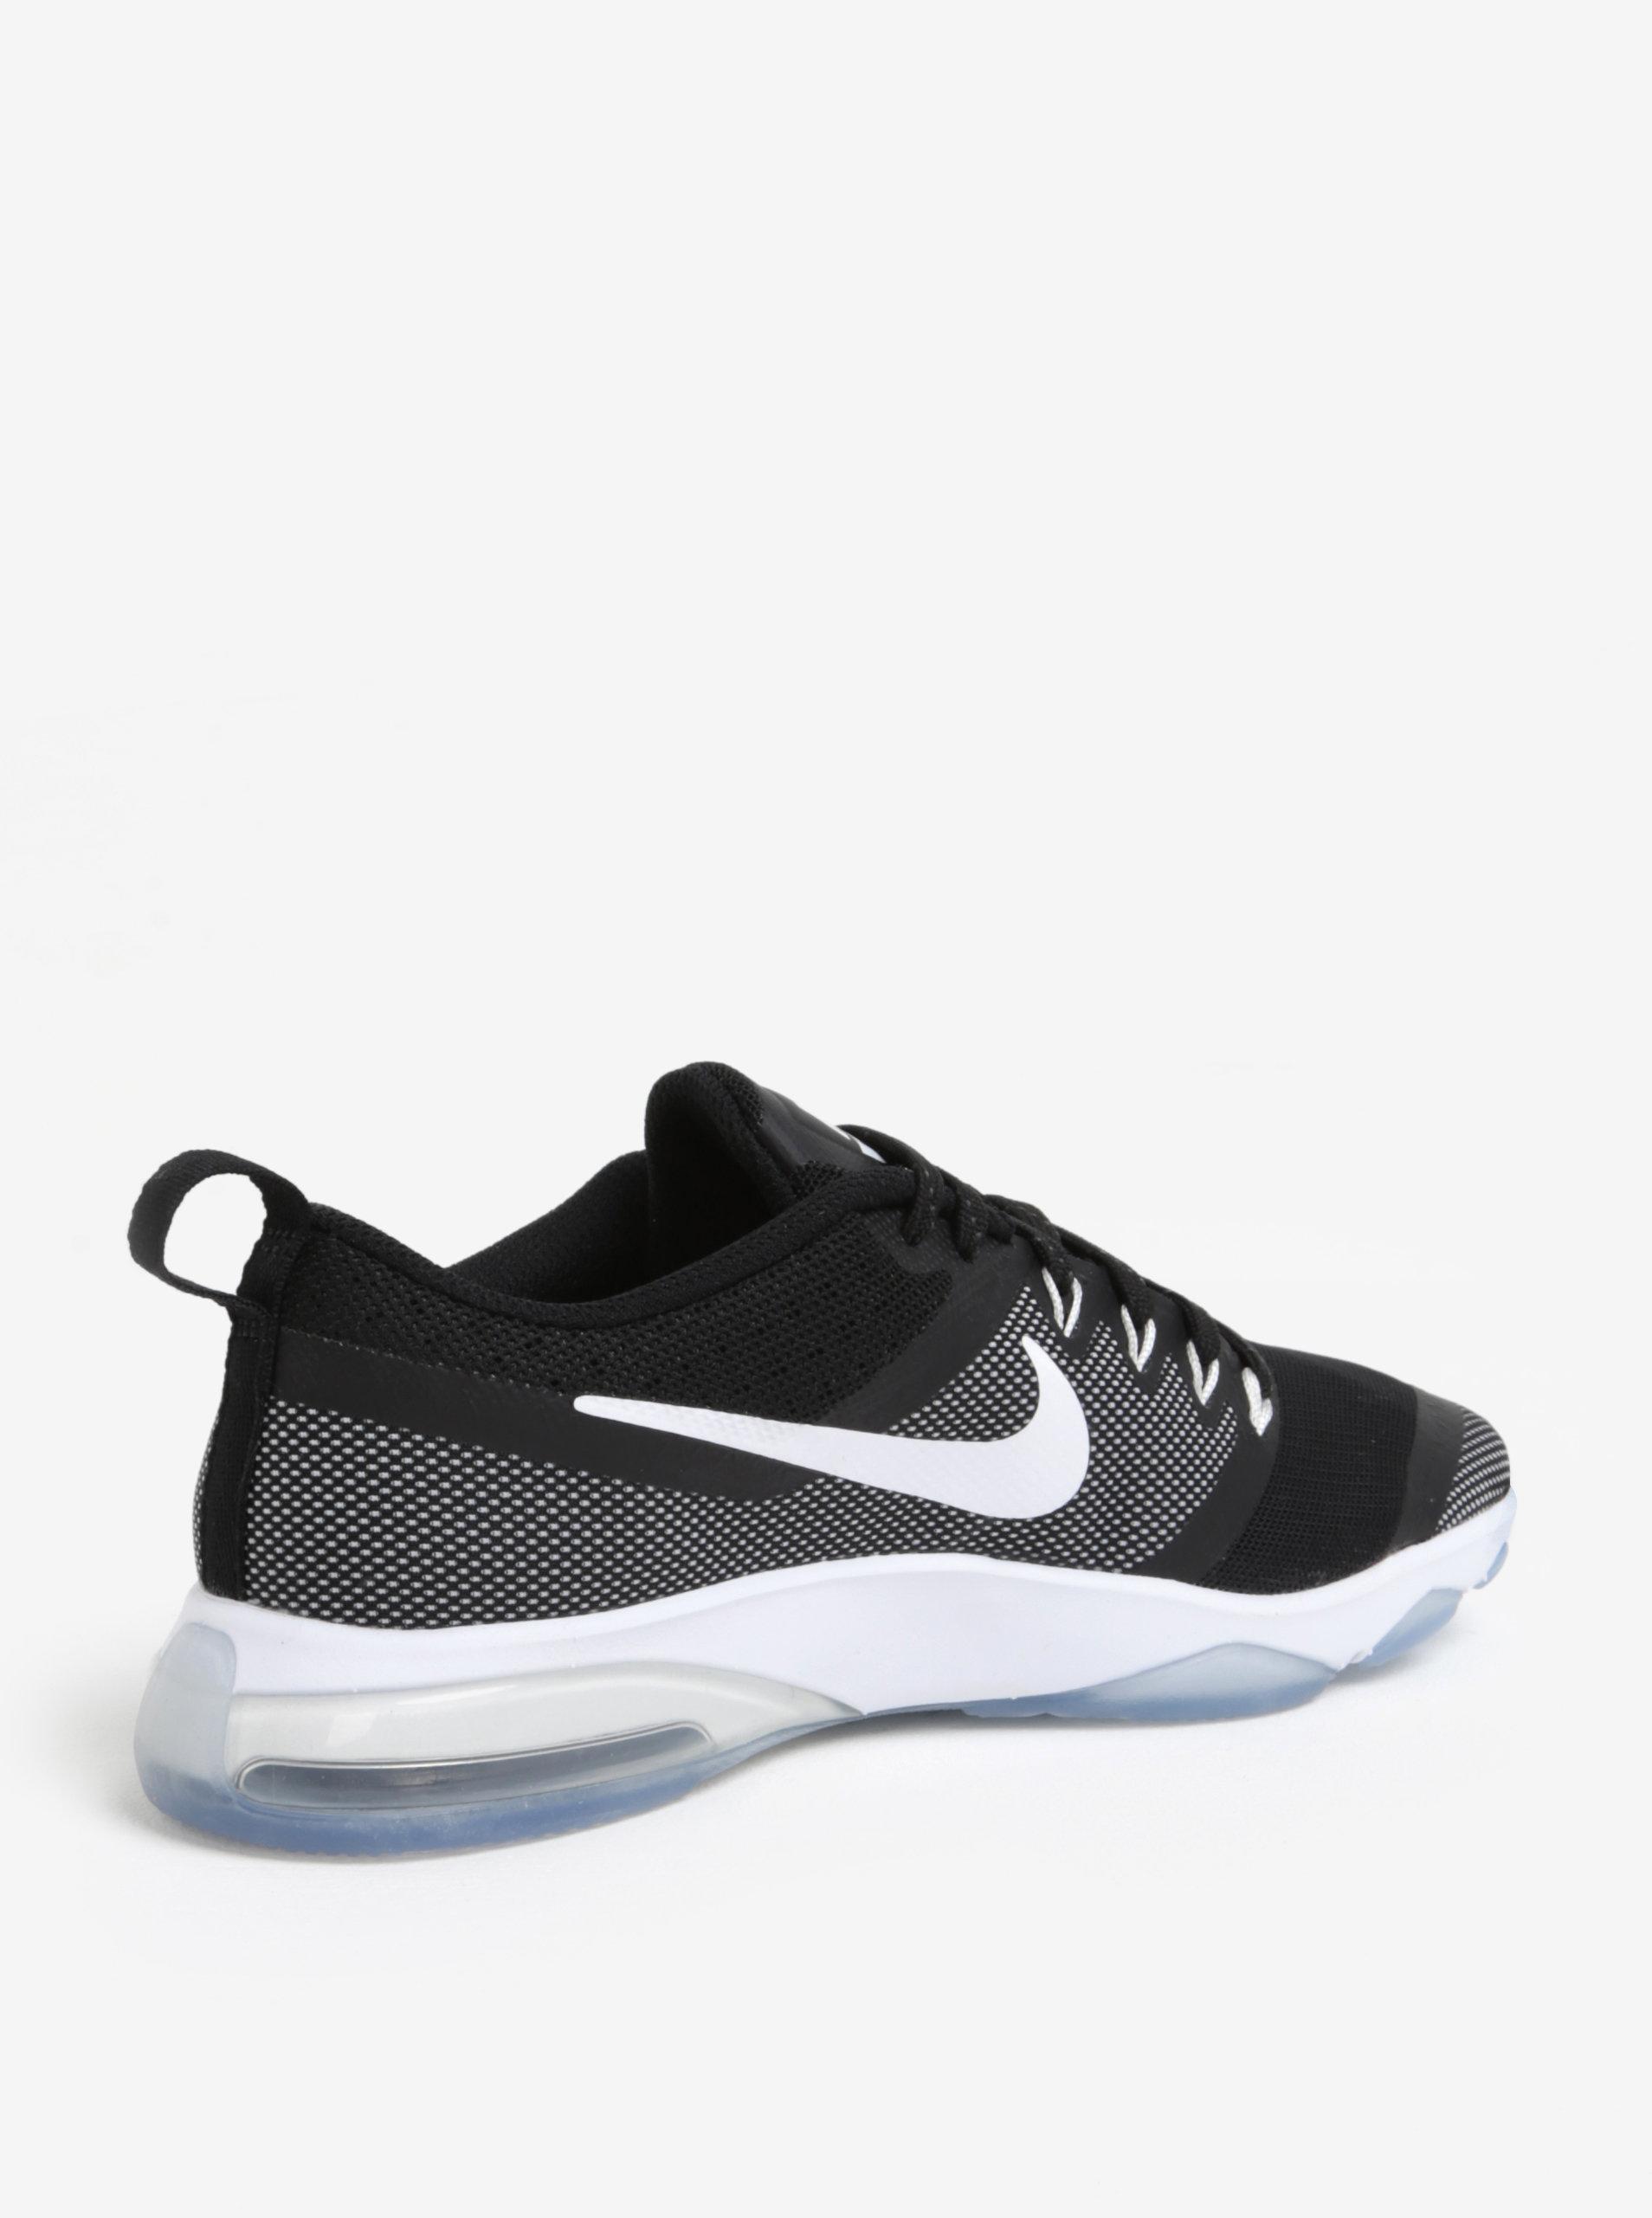 Bielo-čierne dámske tenisky Nike Zoom Fitness Training ... a465647bd3e